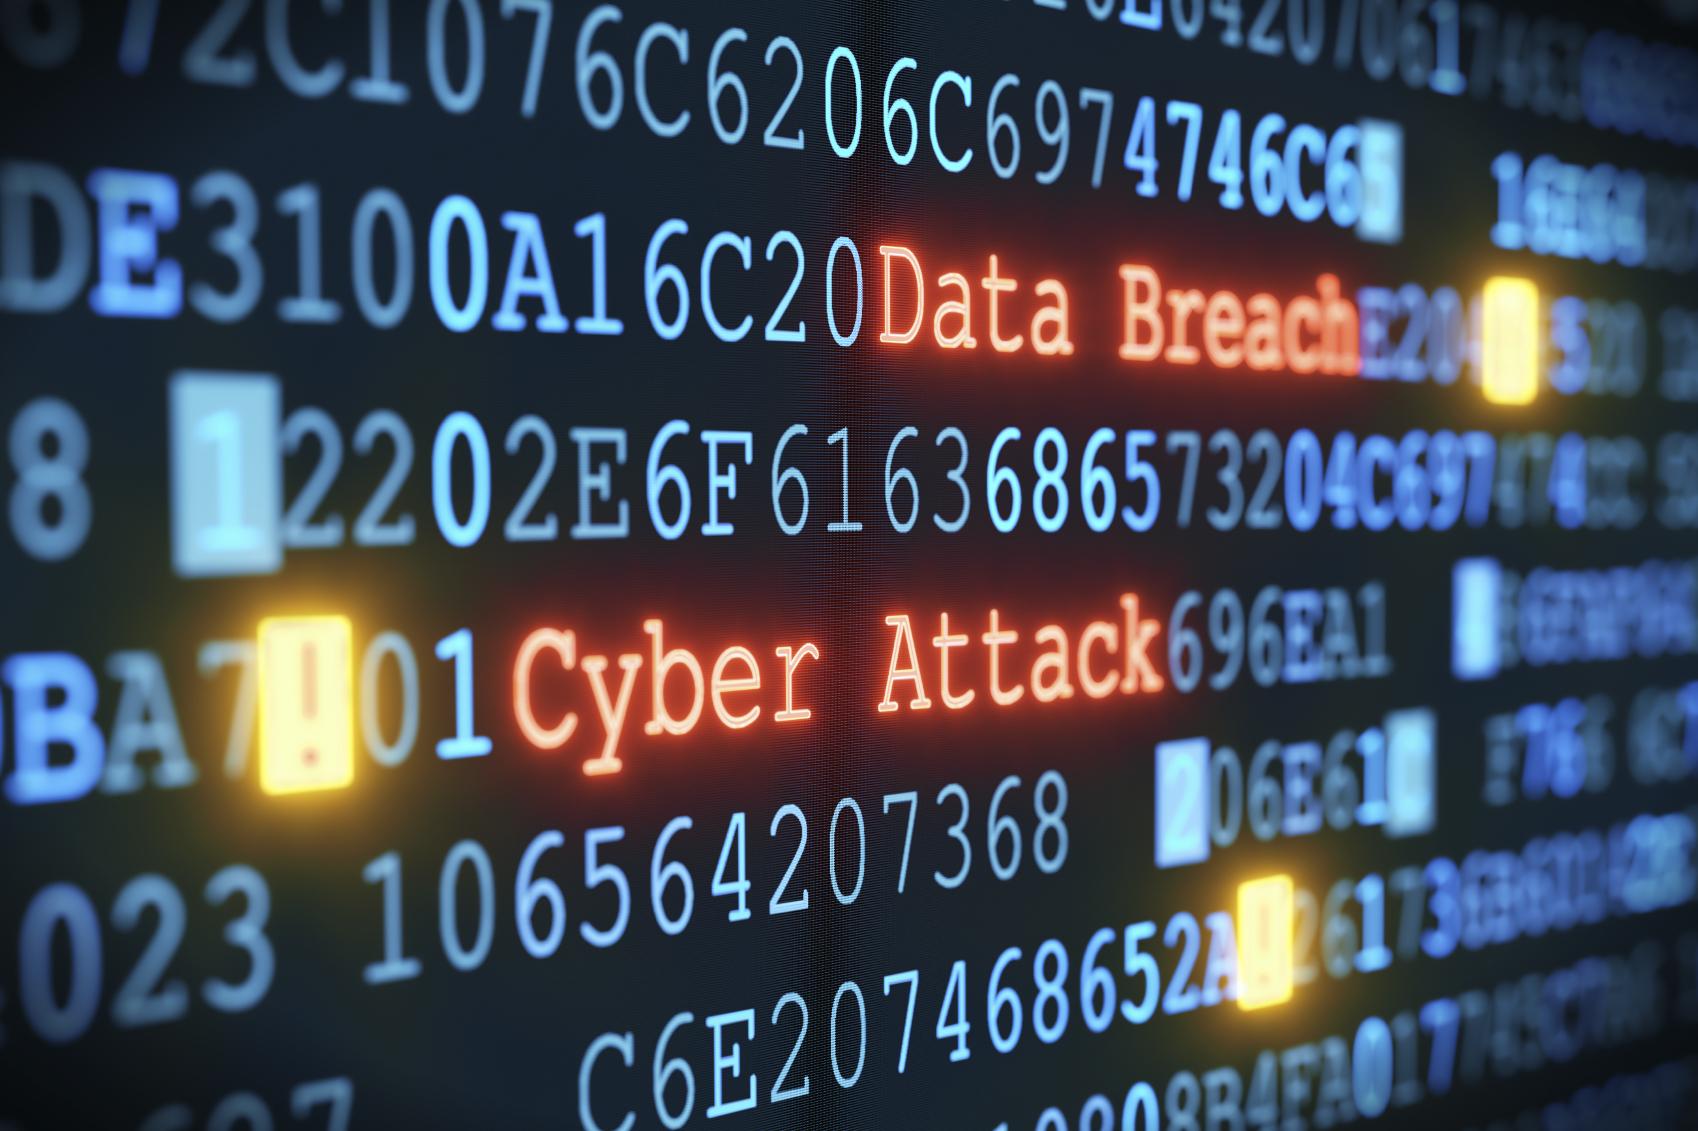 Nigerian Govt Issues Advisory On Massive Global Cyber Attack